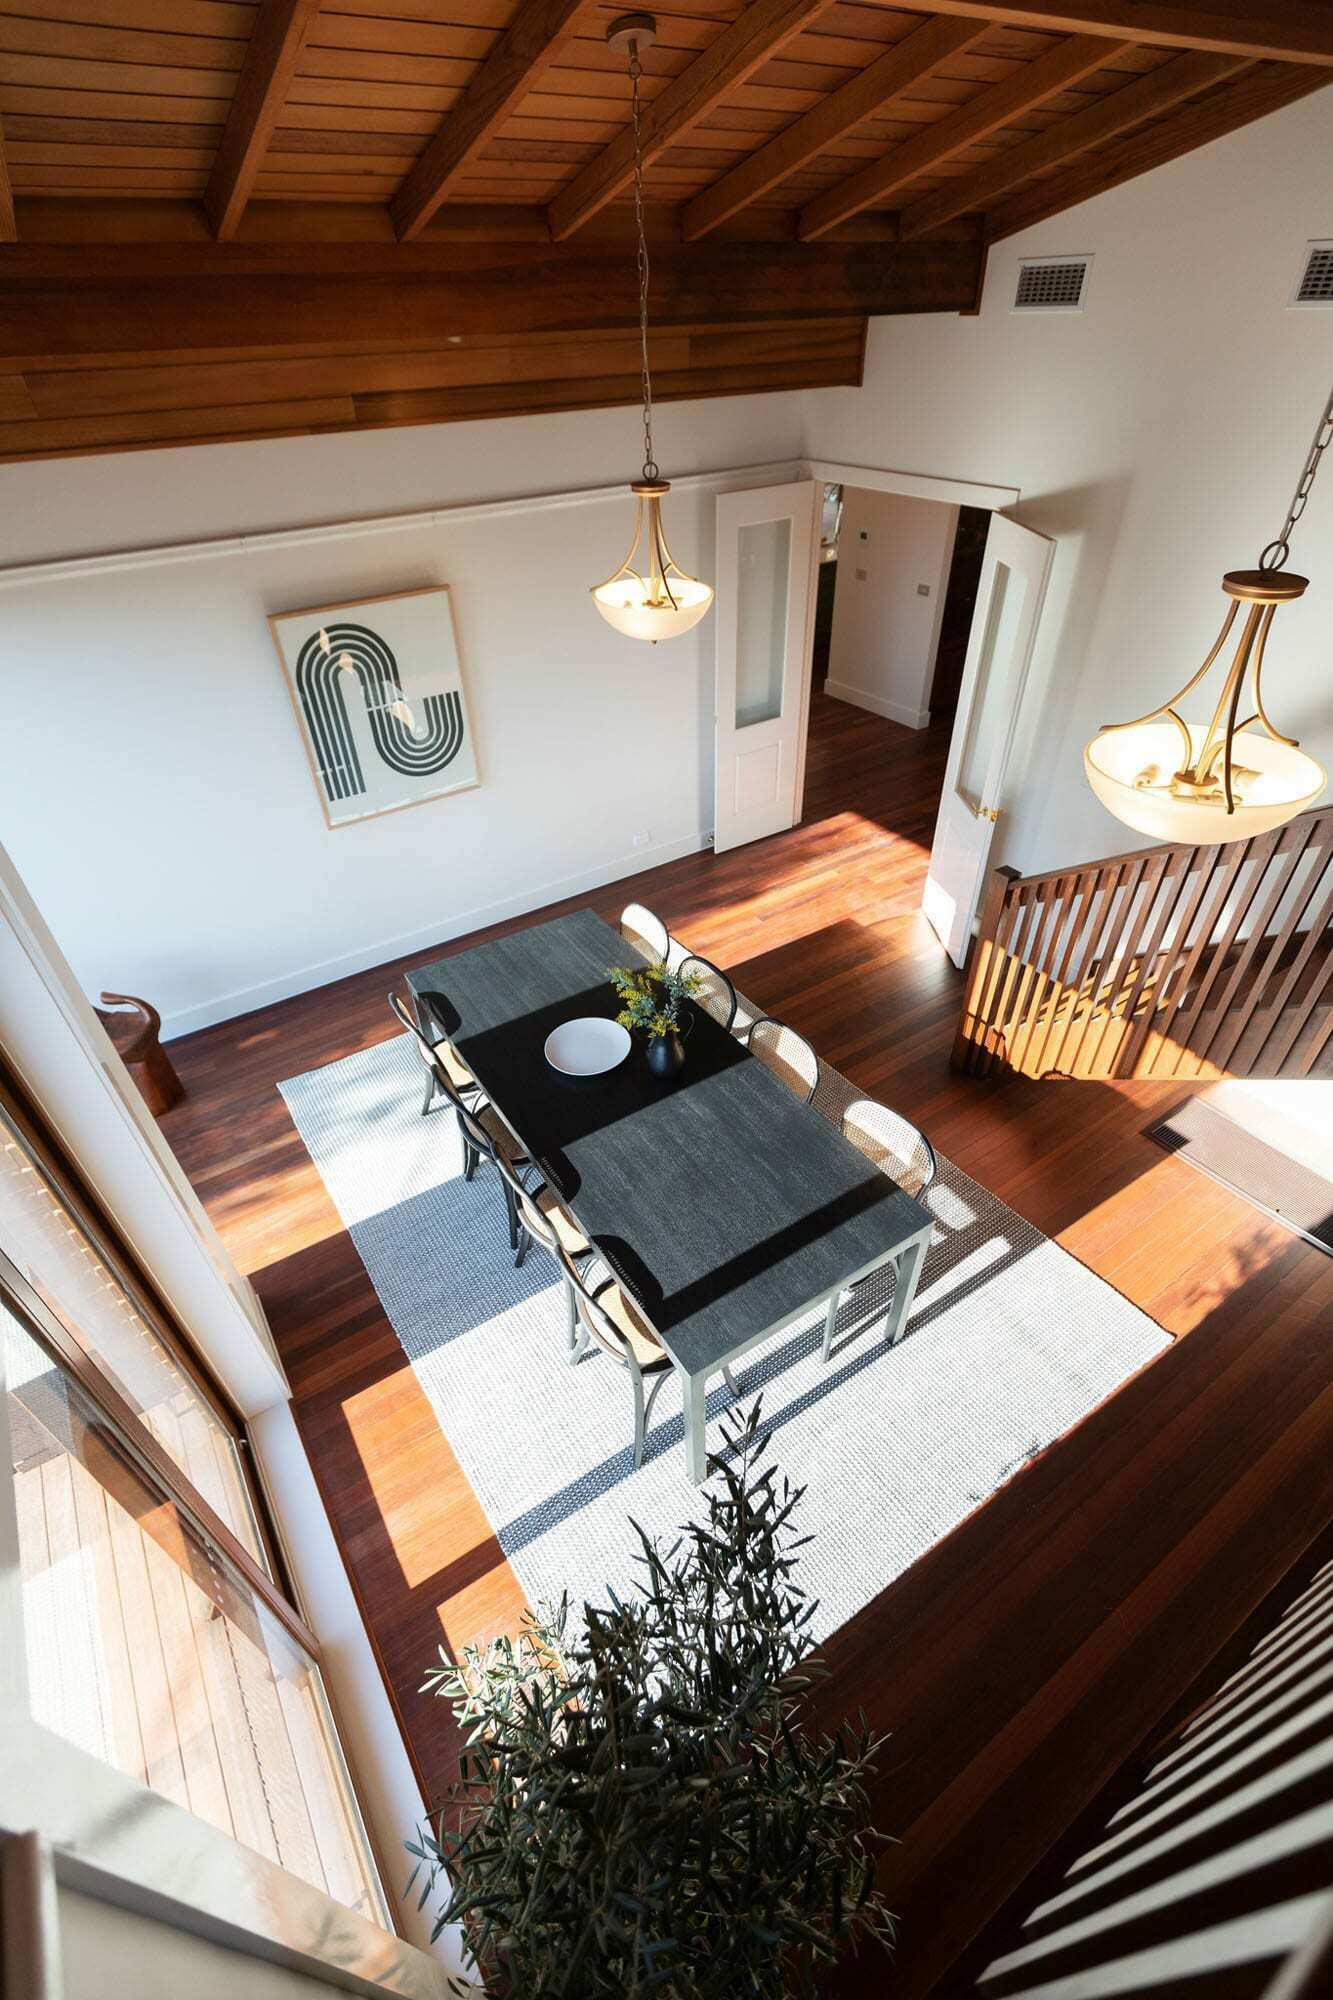 Homes by Howe Canberra builder – Governor Generals' renovation extension – Formal dining